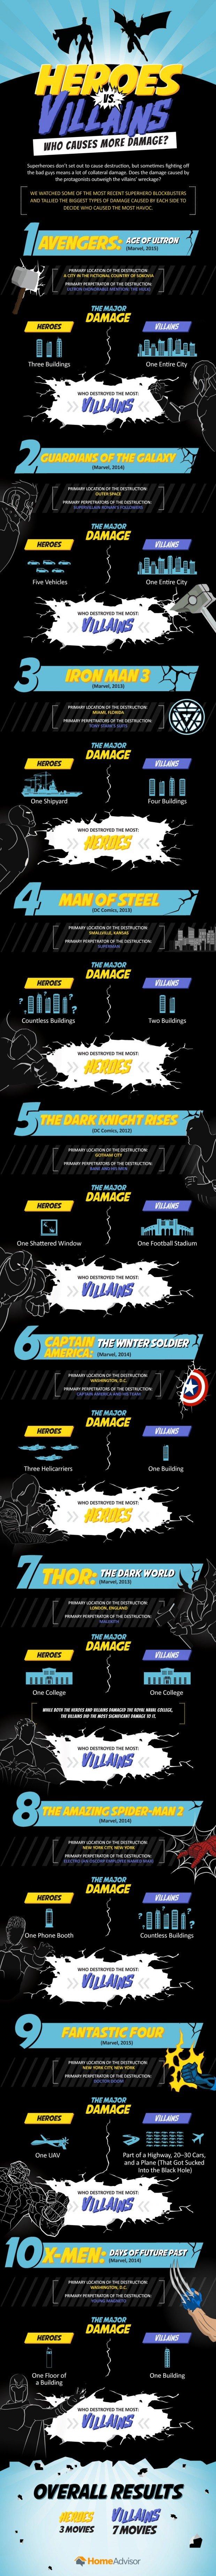 heroes_vs_villains_info_2